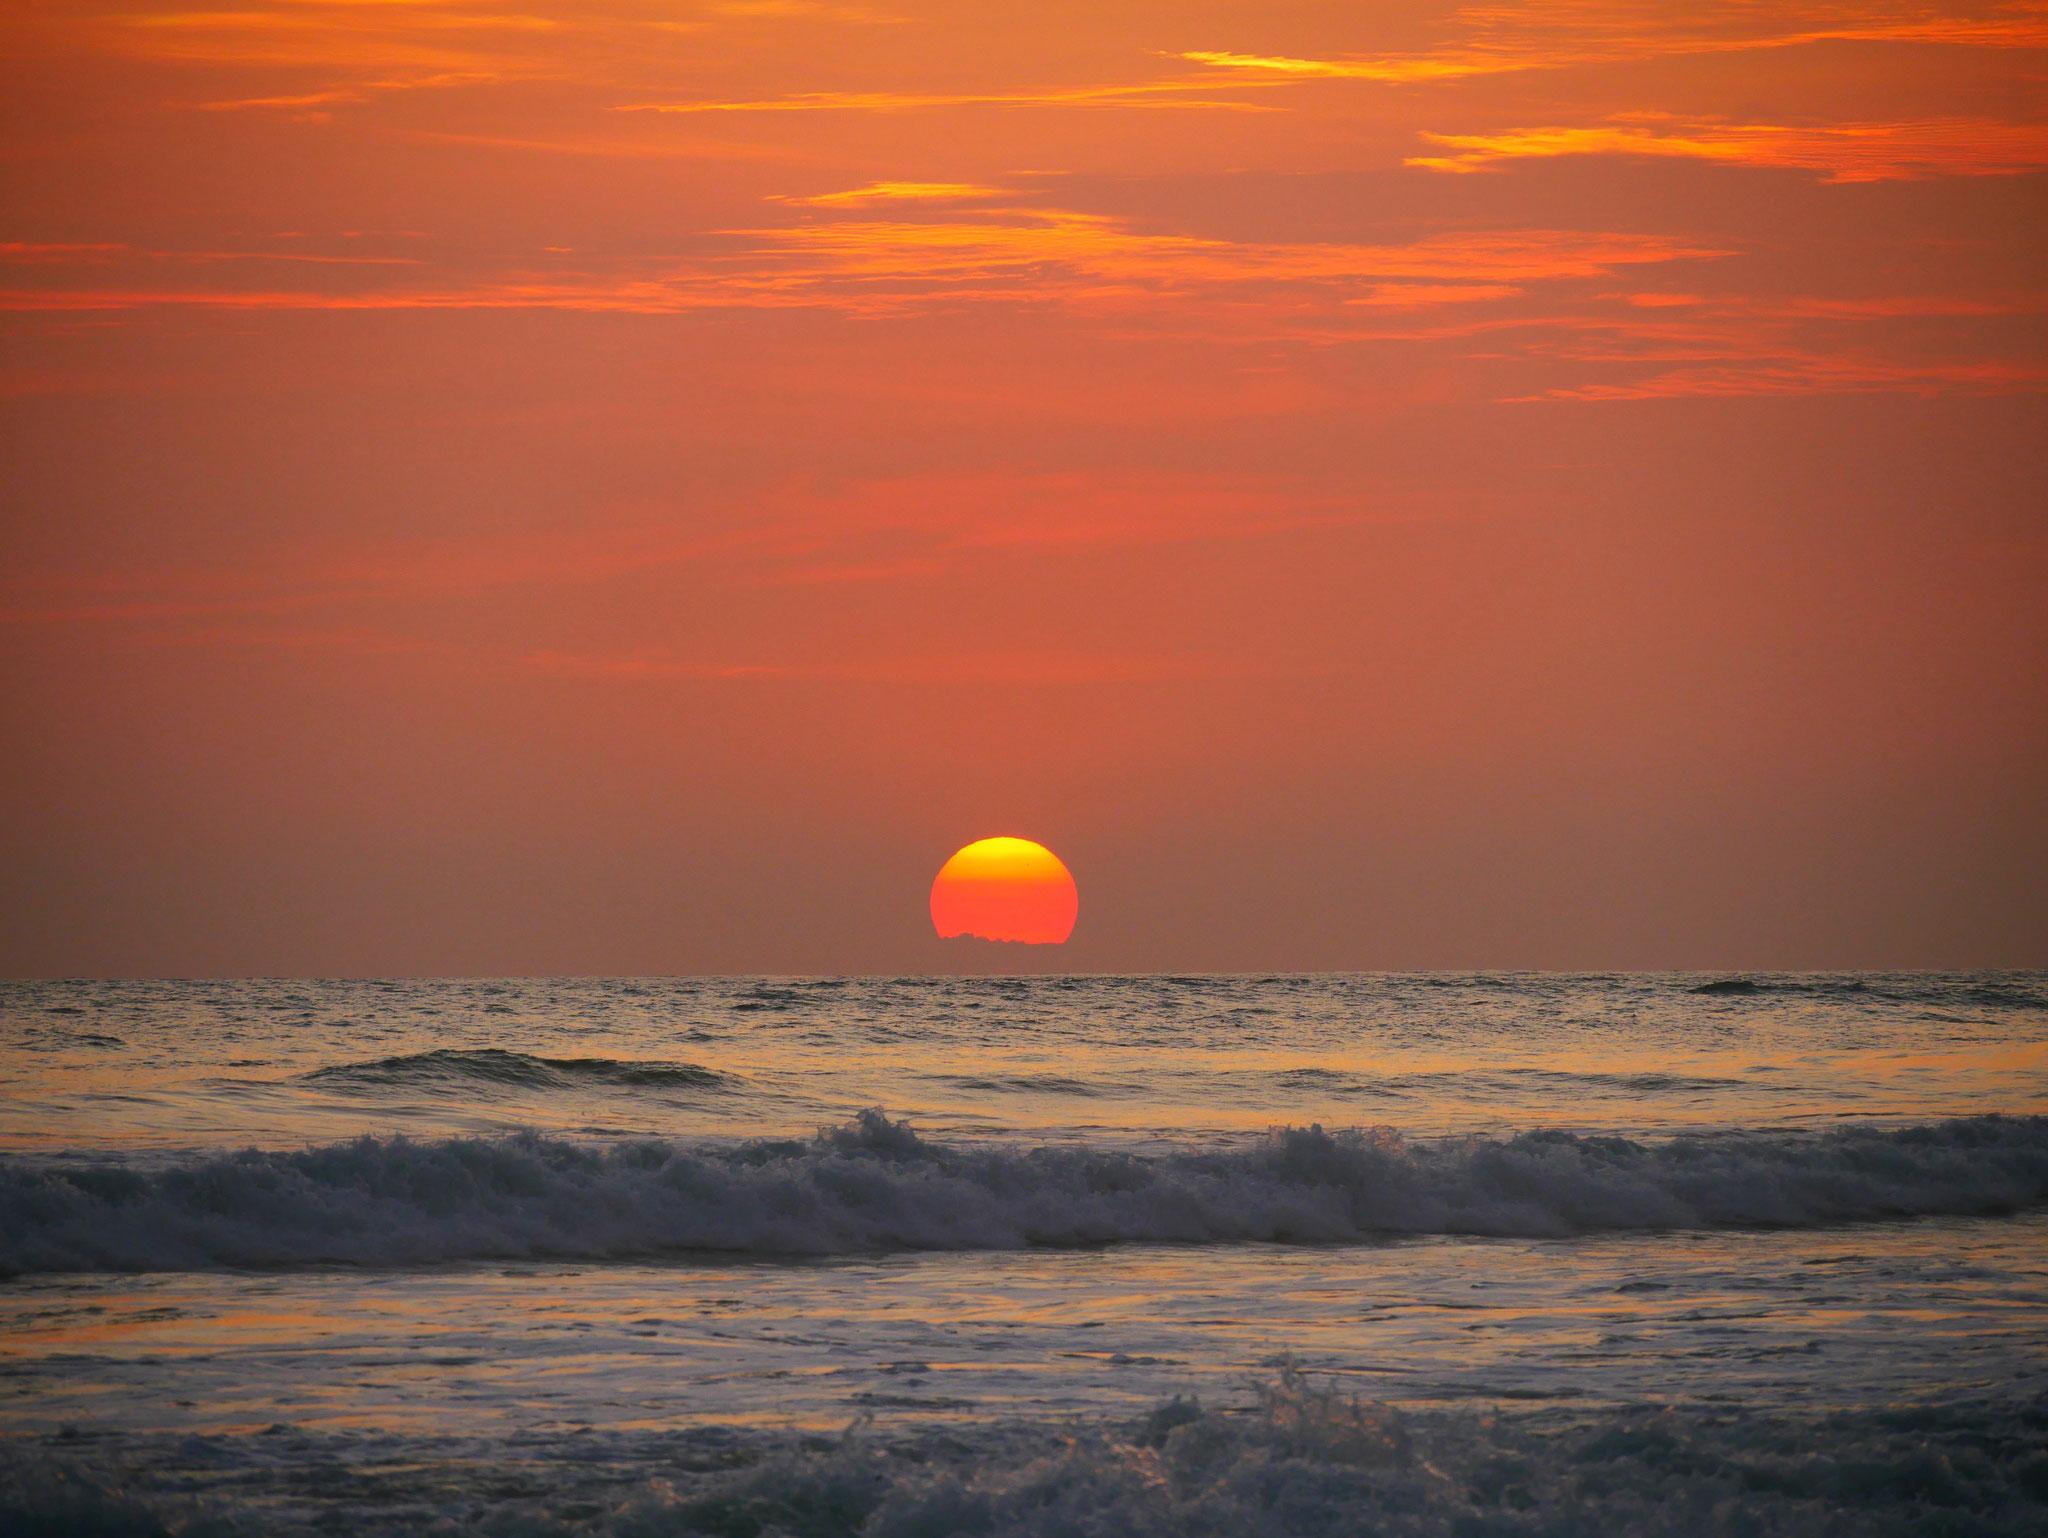 Sonnenuntergang in Santa Teresa